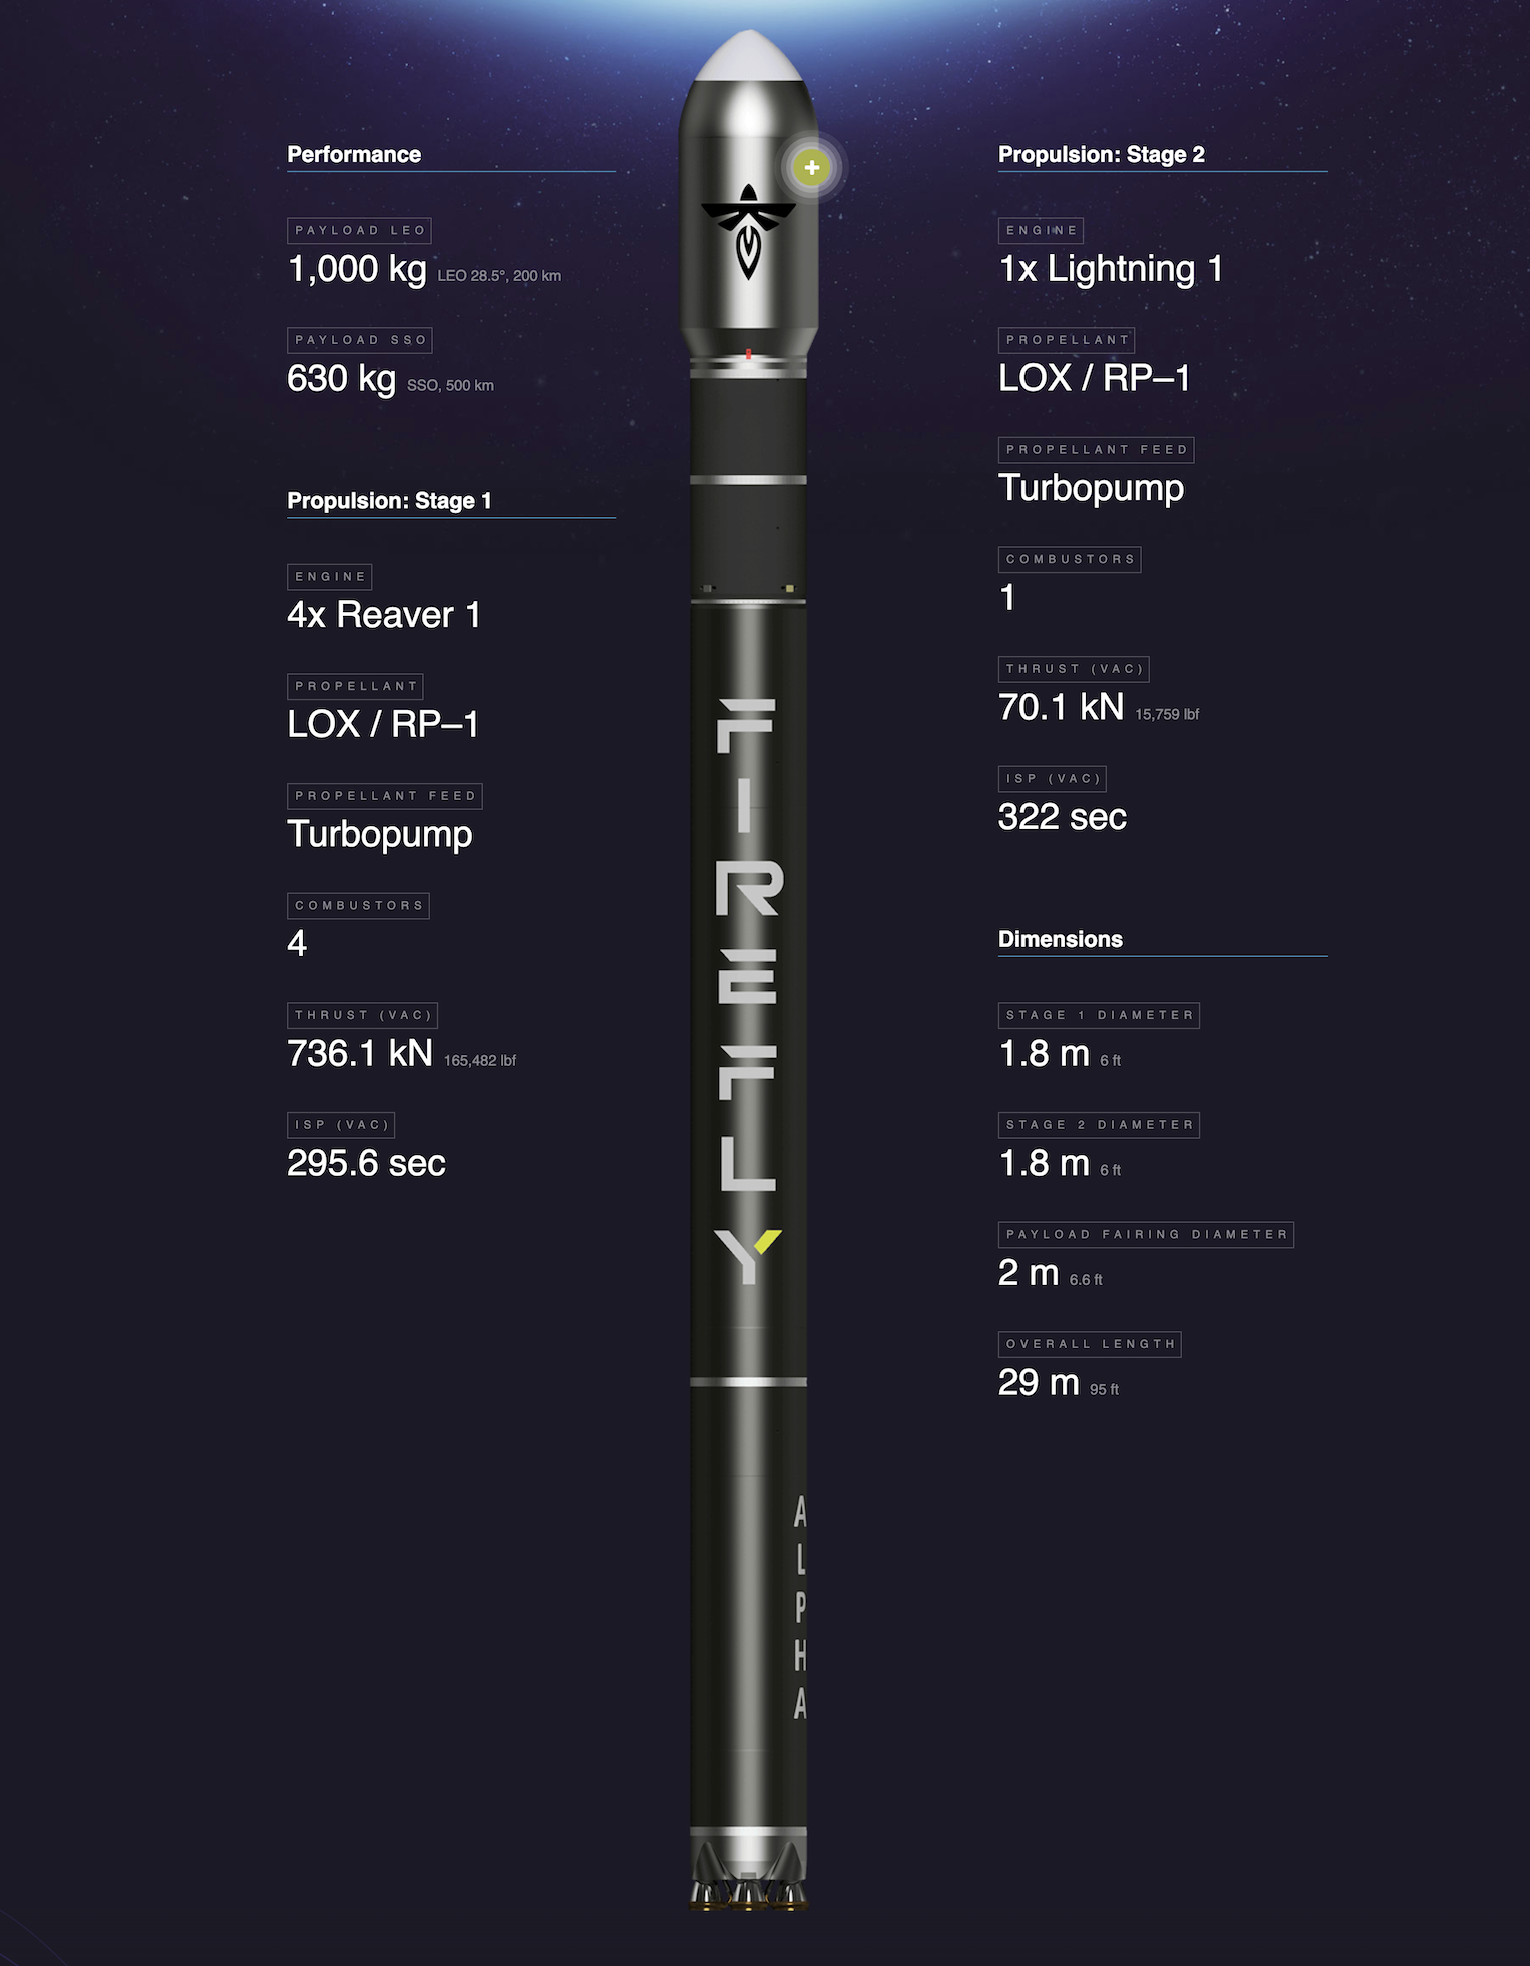 Especificaciones del cohete Firefly Alpha de Firefly Aerospace